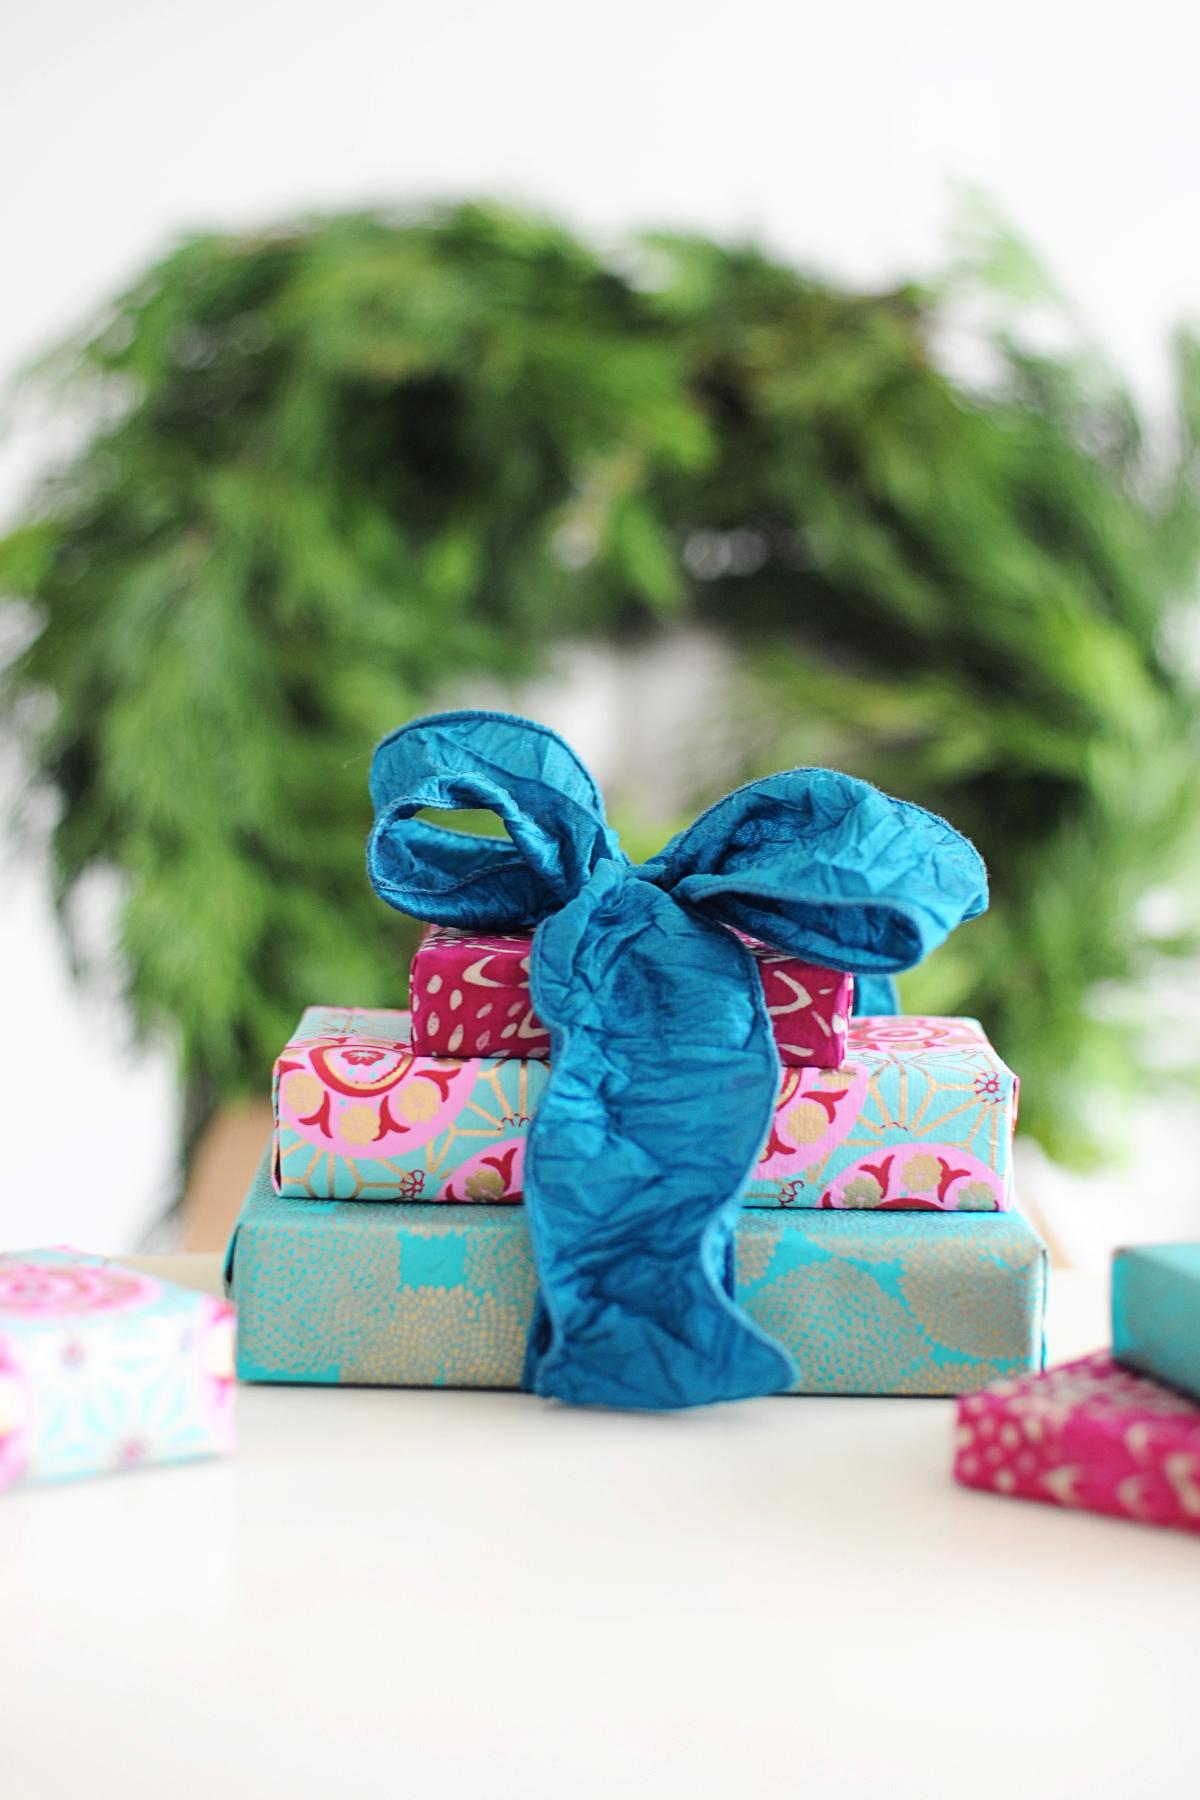 Best Last Minute Christmas Shopping Tips